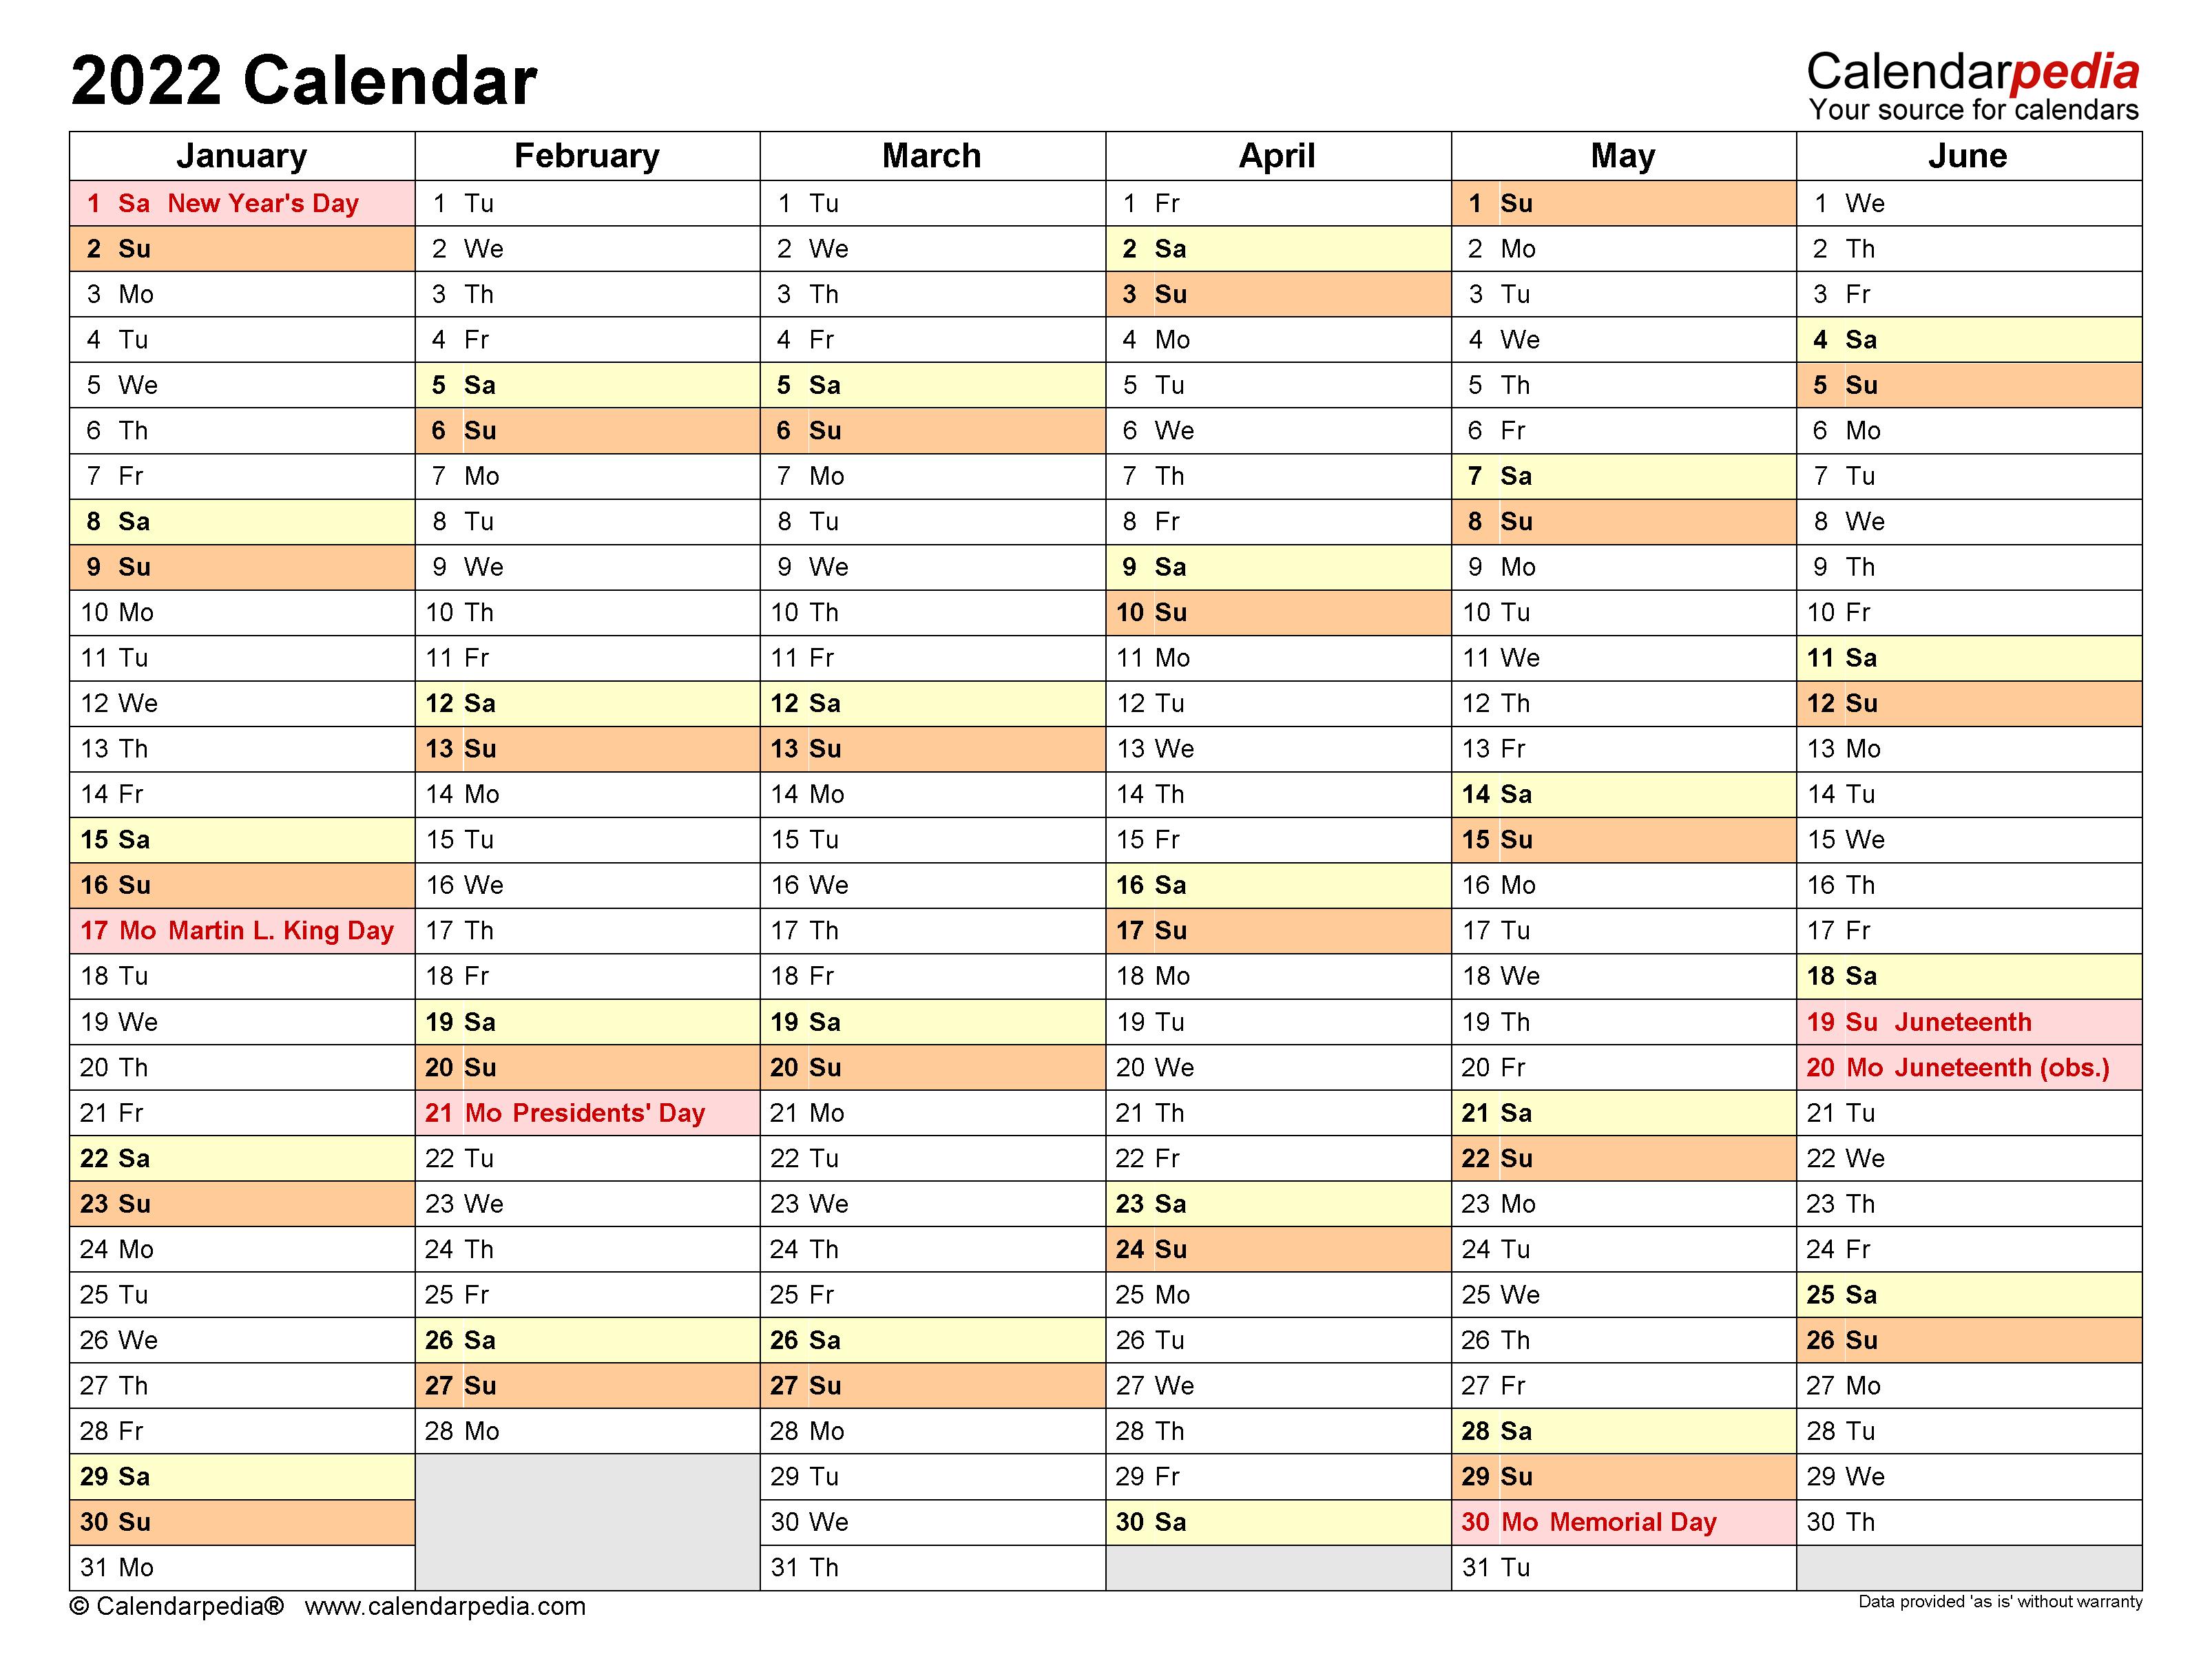 2022 Calendar - Free Printable Microsoft Word Templates